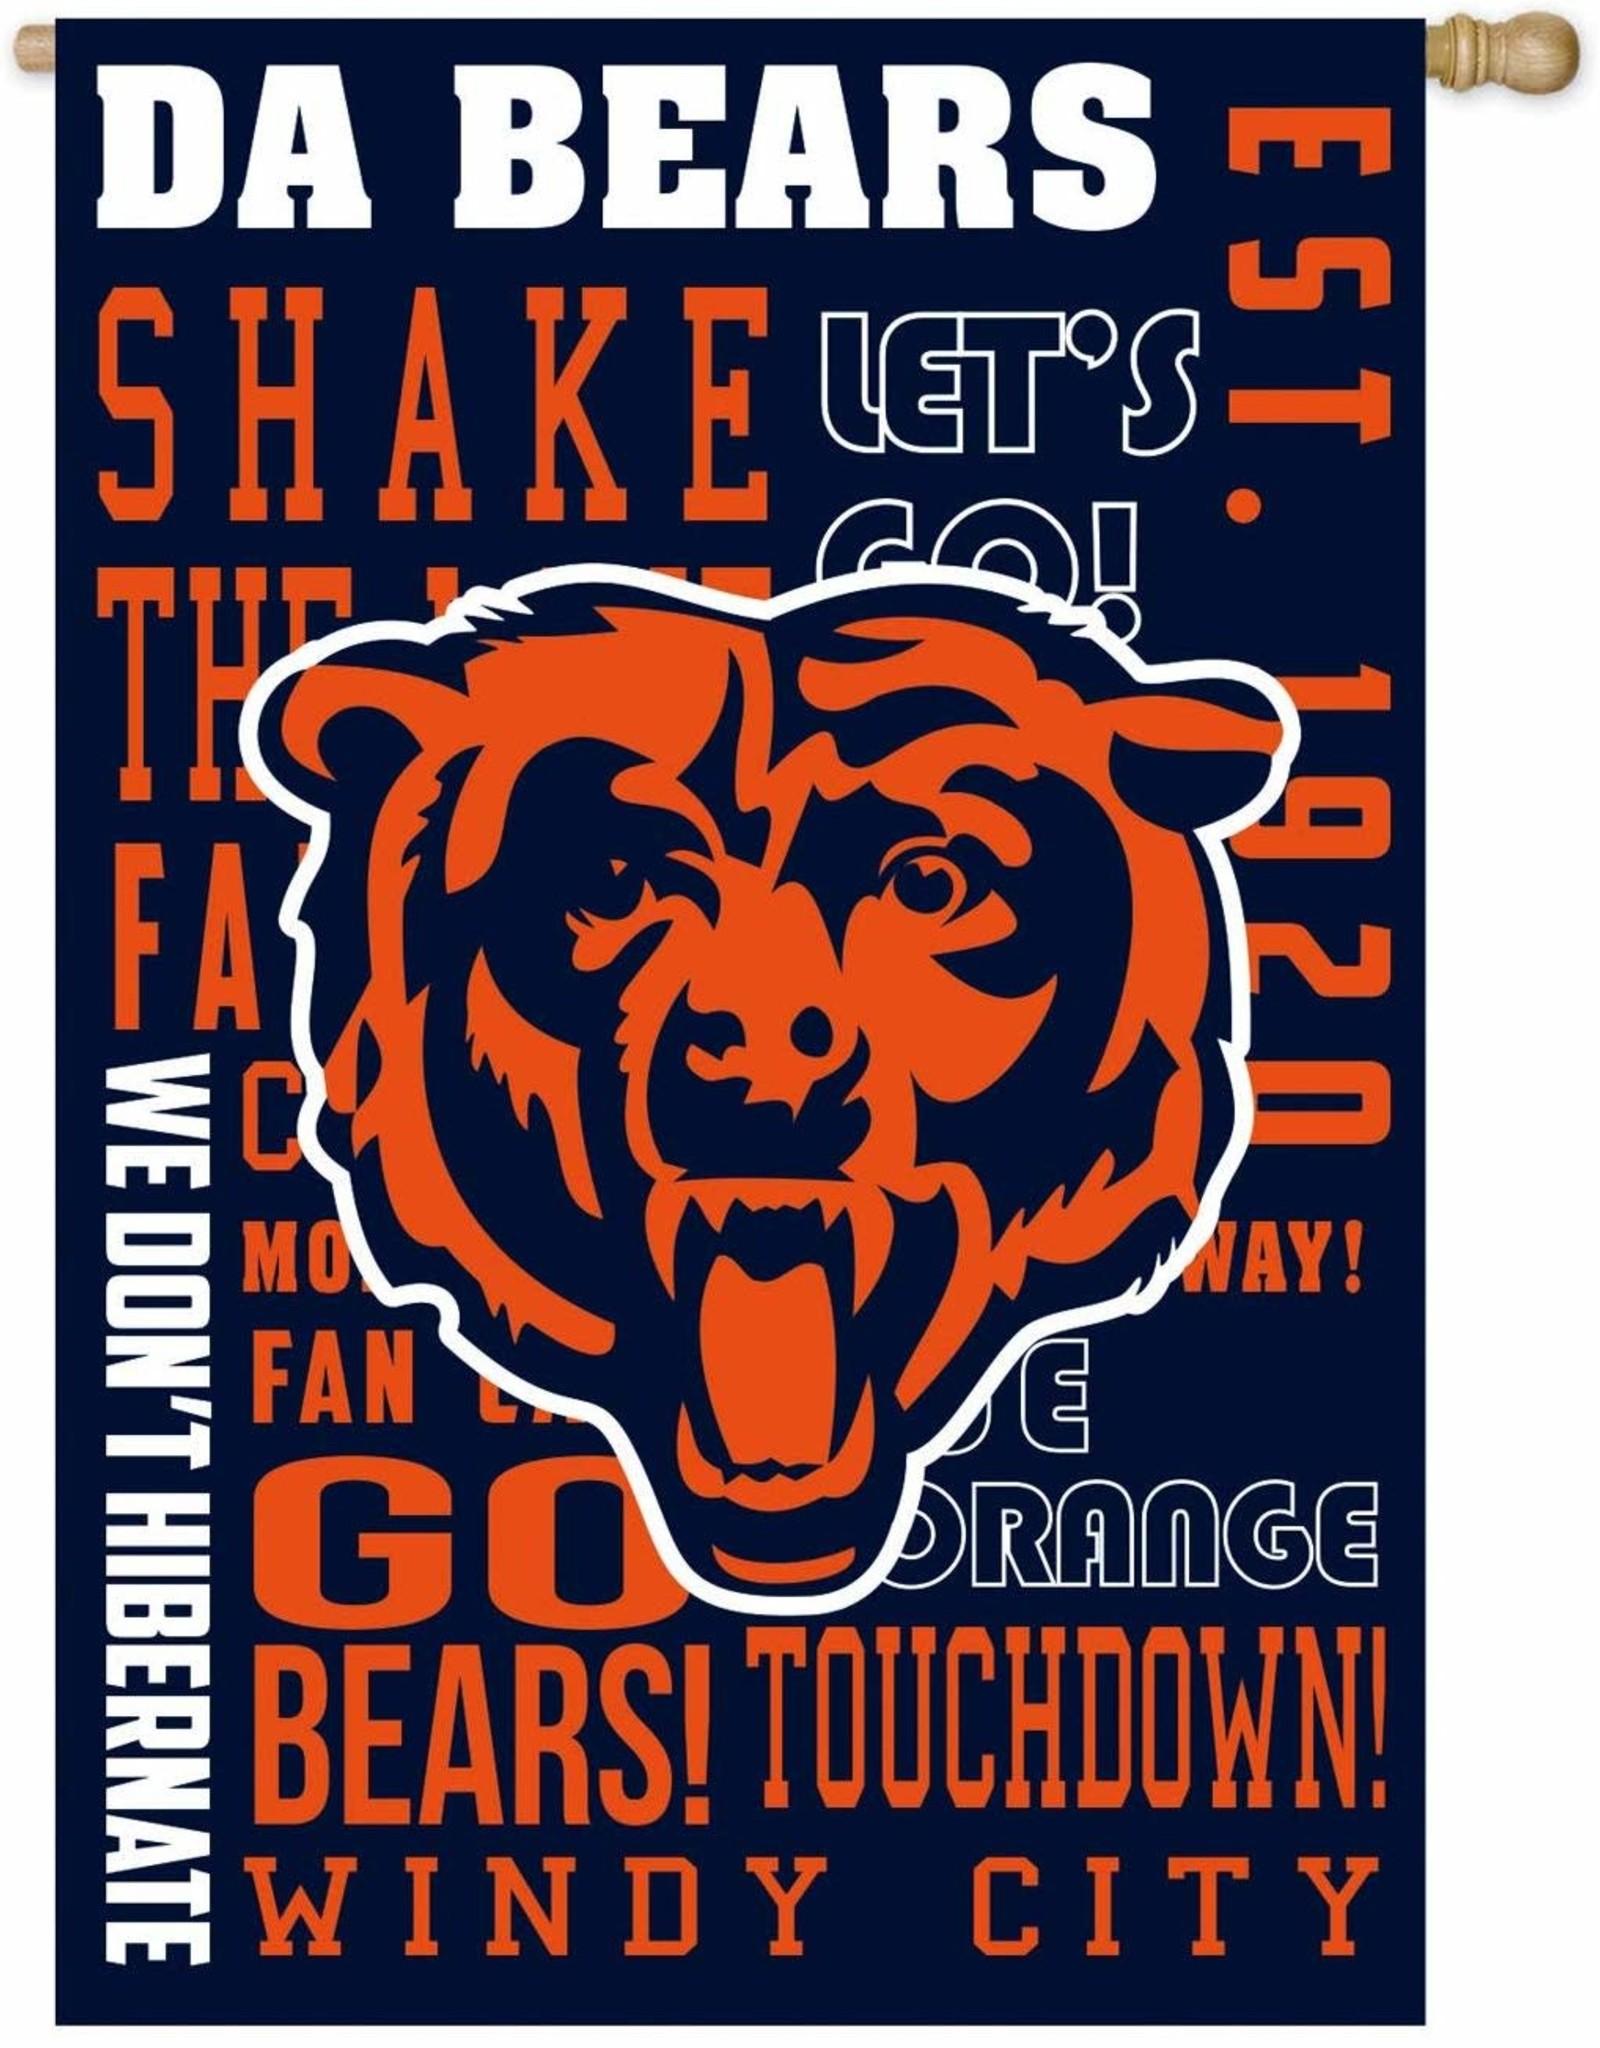 Pretty Strong Bears Fan Rules Flag